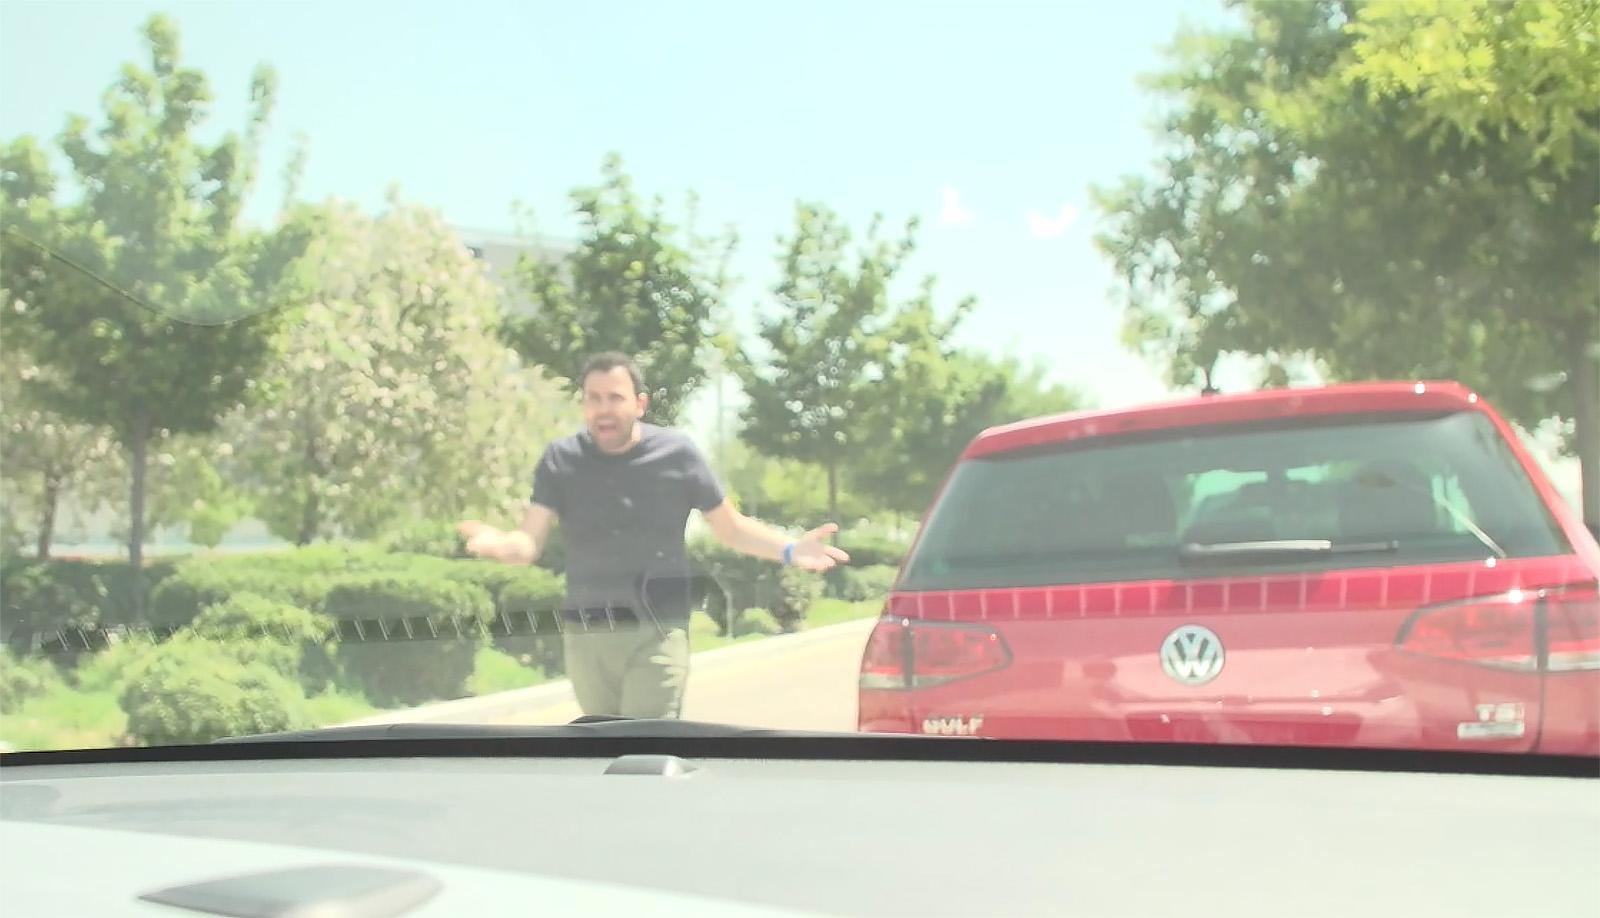 Conductor agresivo